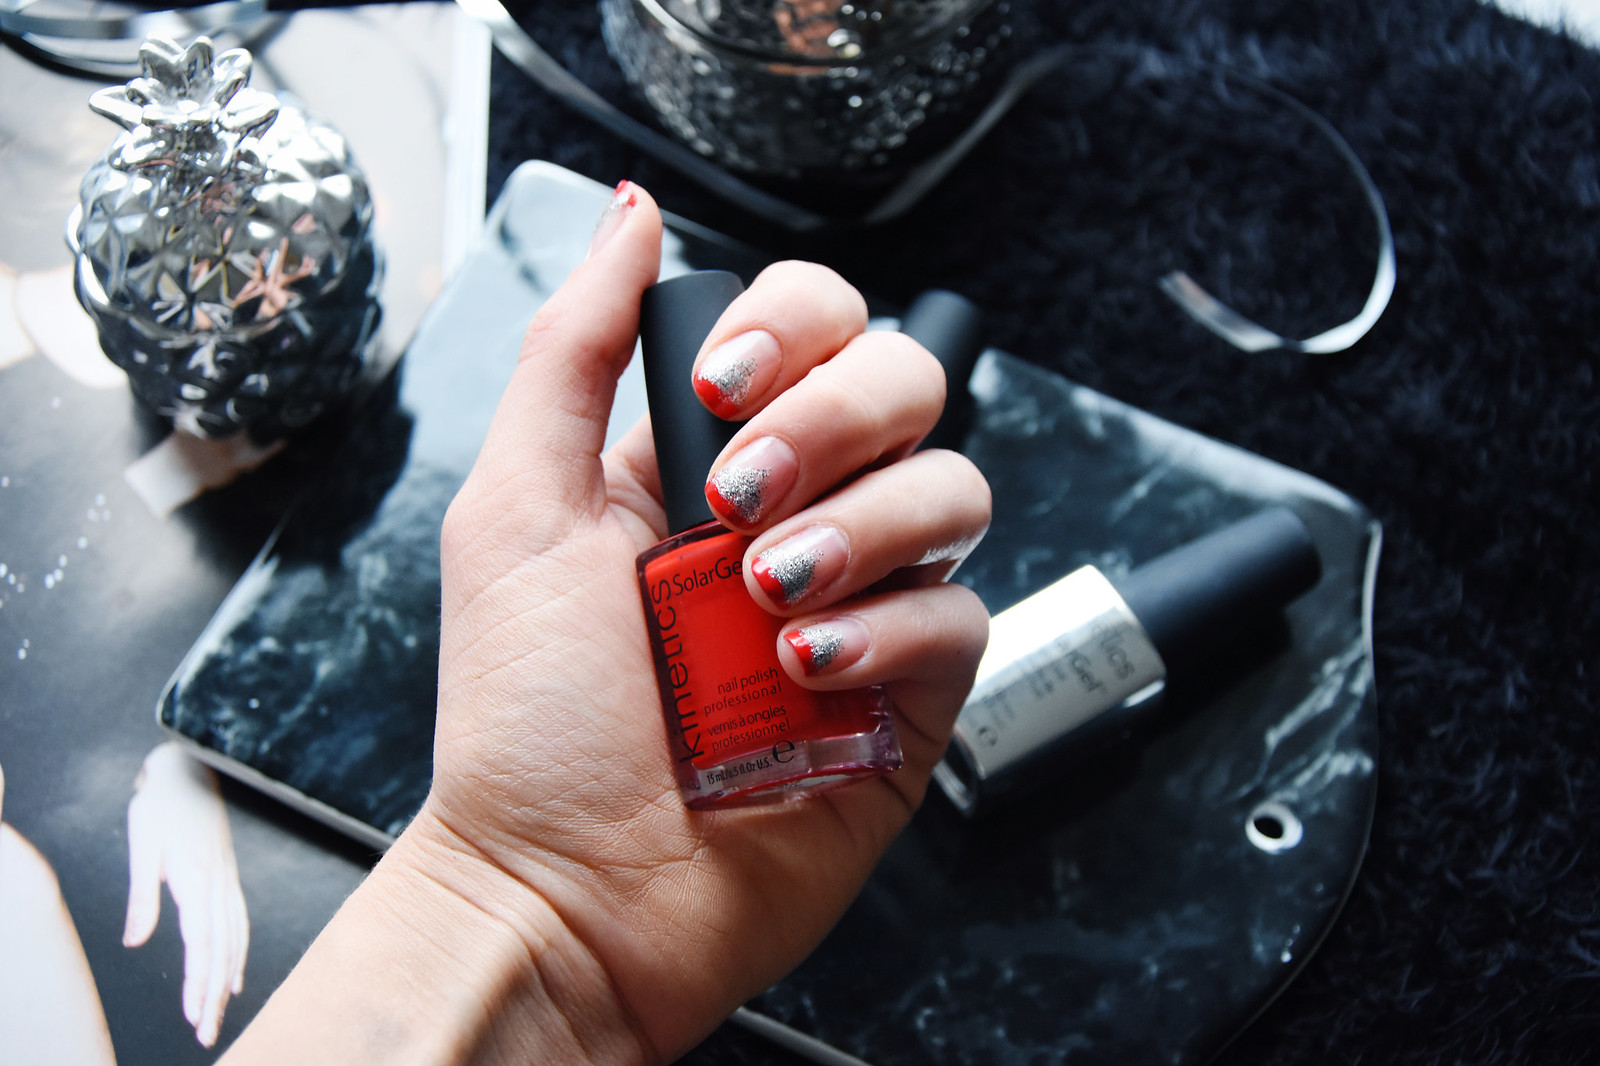 Glitter manicure inspiration